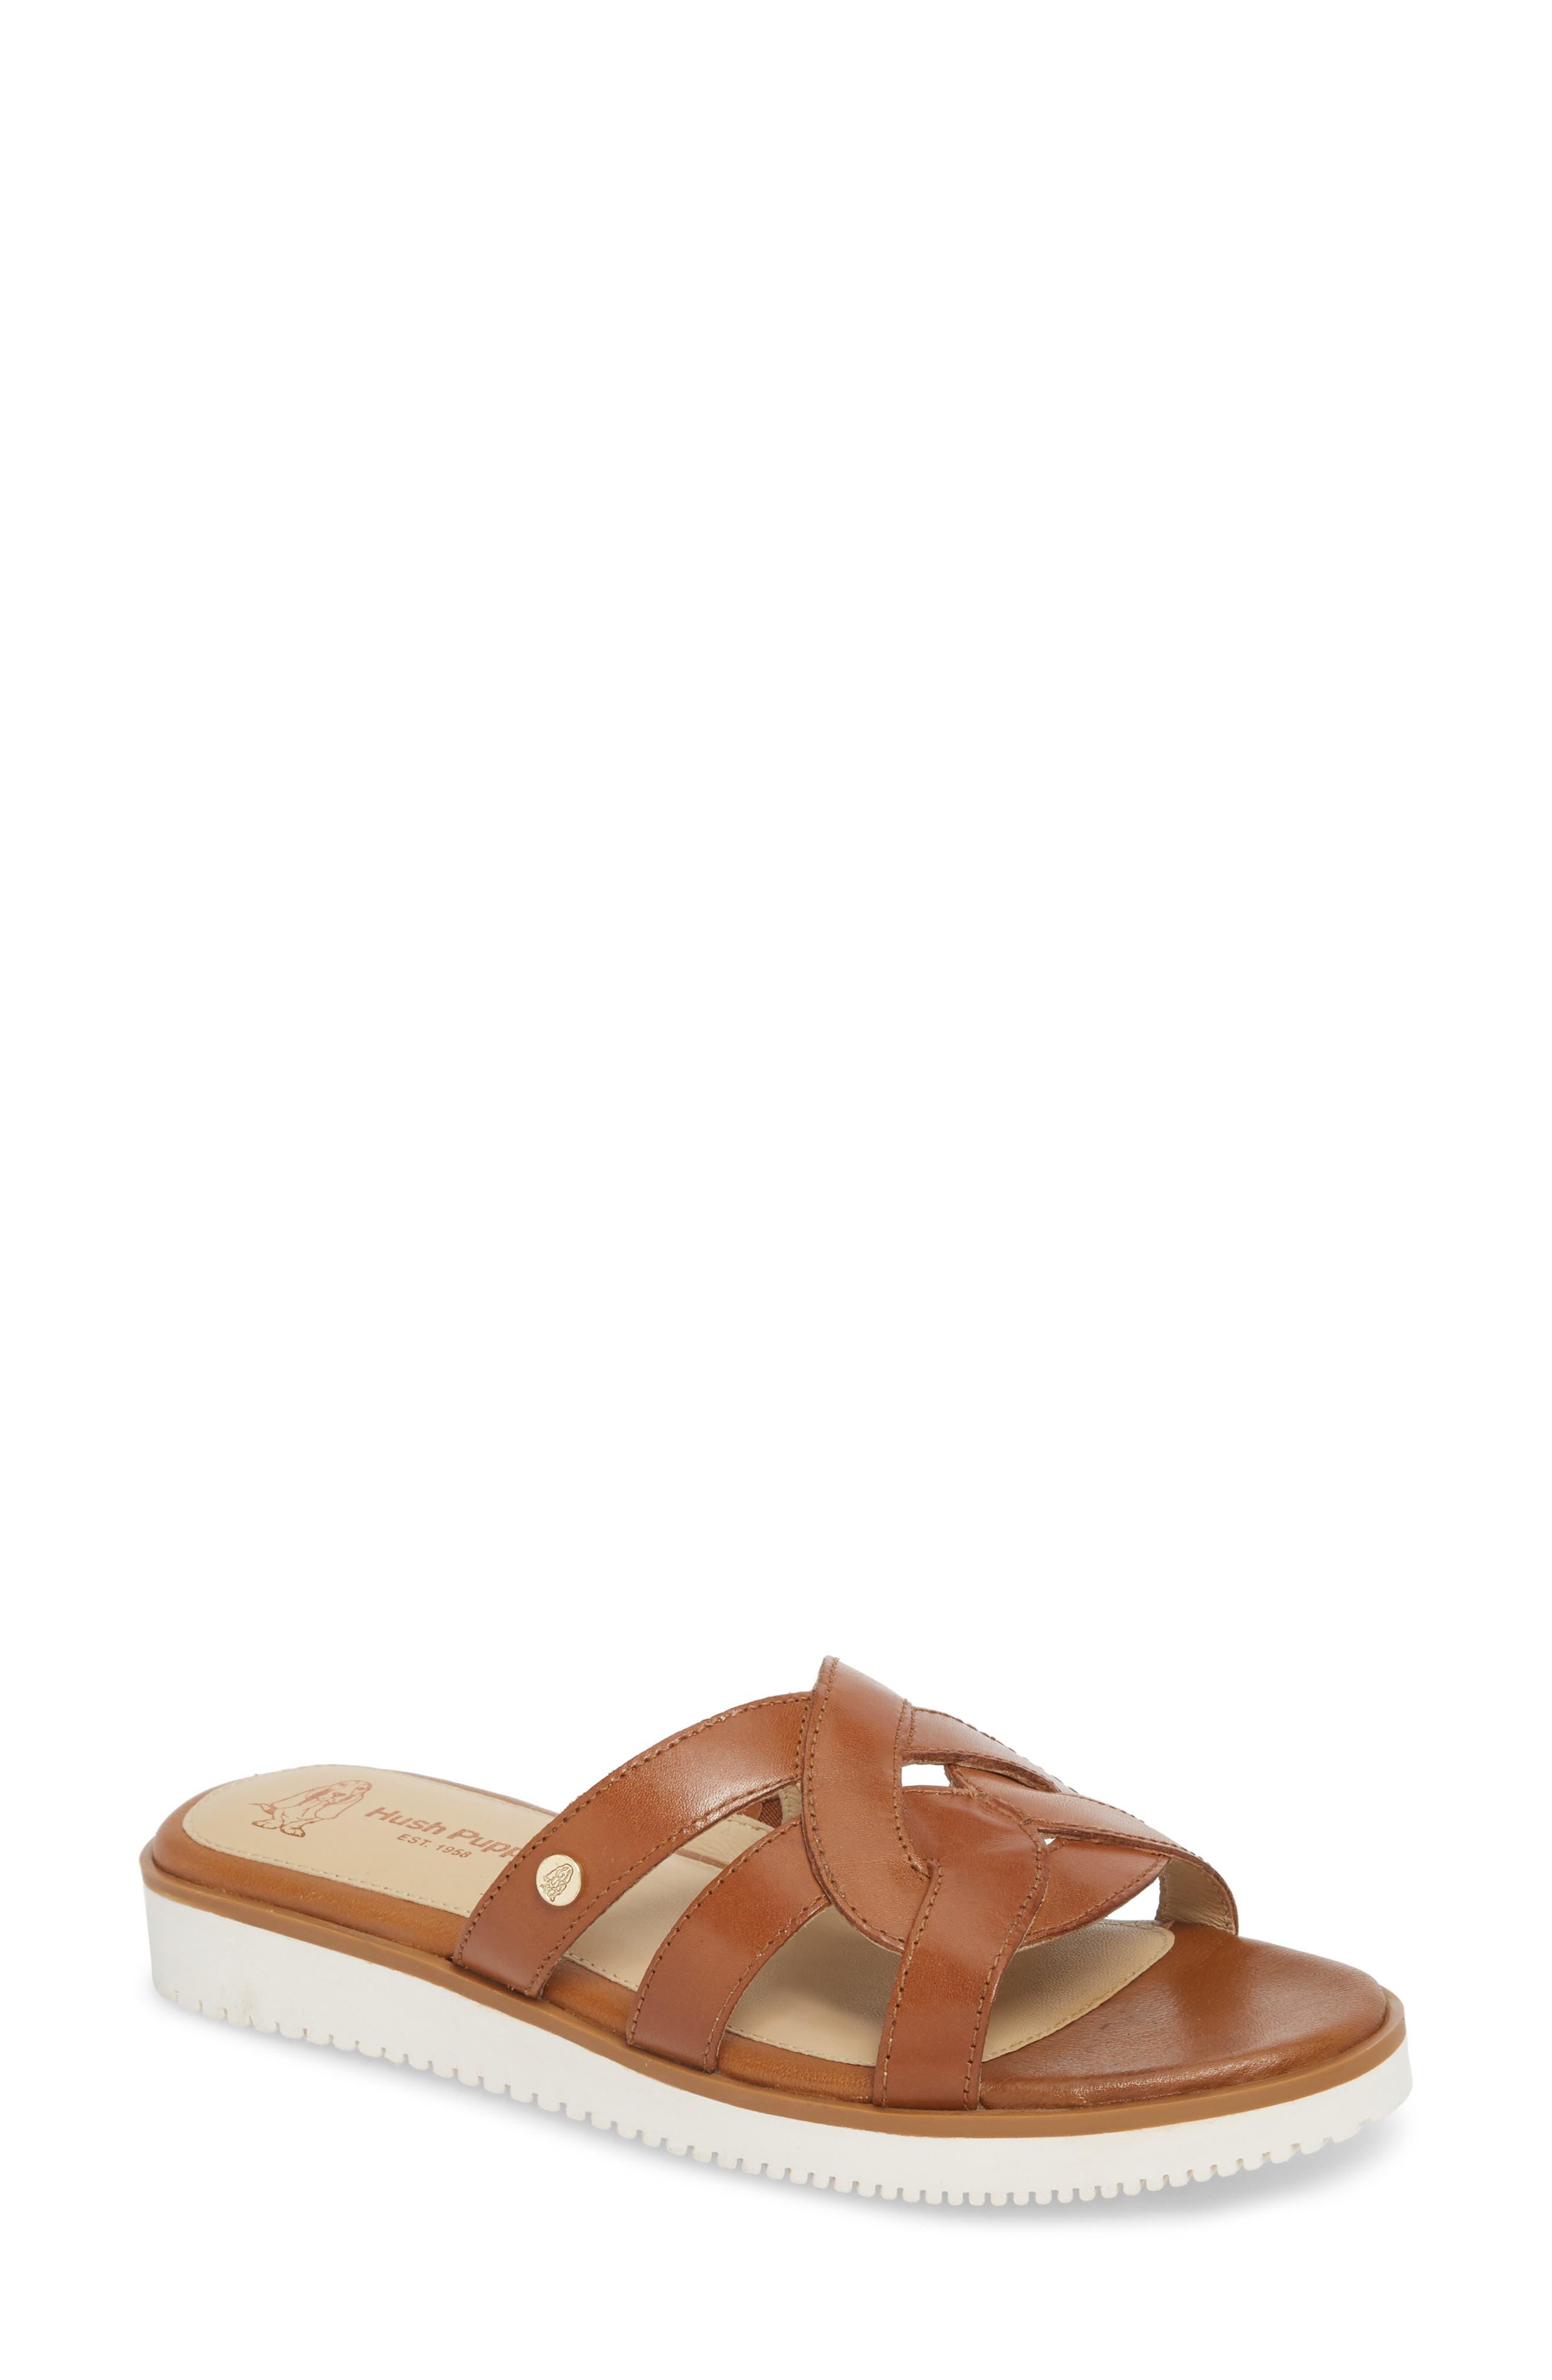 Braid Slide Sandal,                             Main thumbnail 1, color,                             Tan Leather